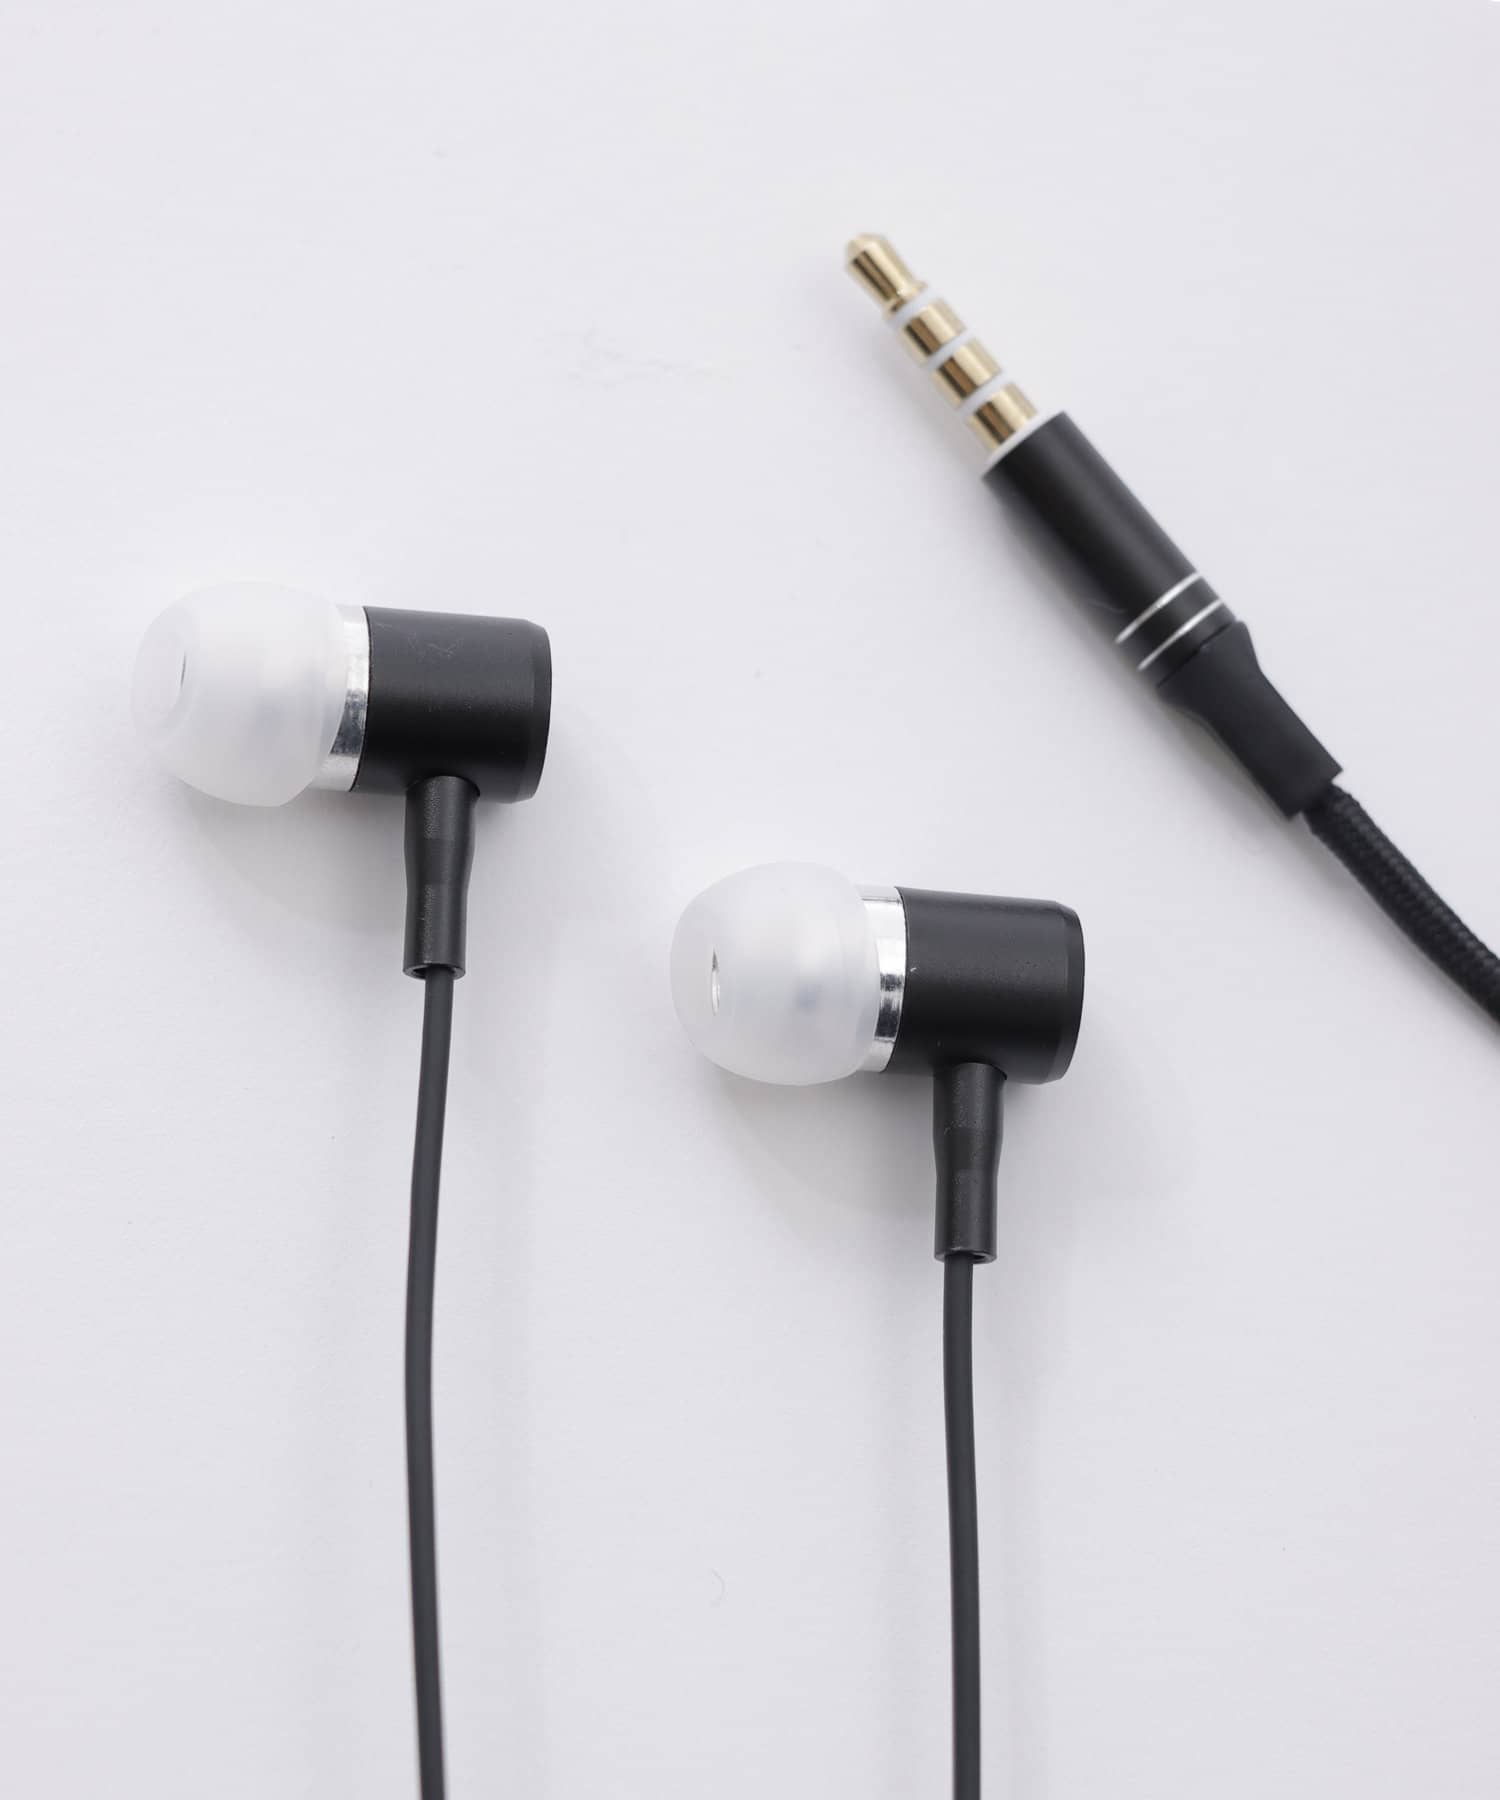 3COINS(スリーコインズ) ライフスタイル 高音質イヤホン ブラック